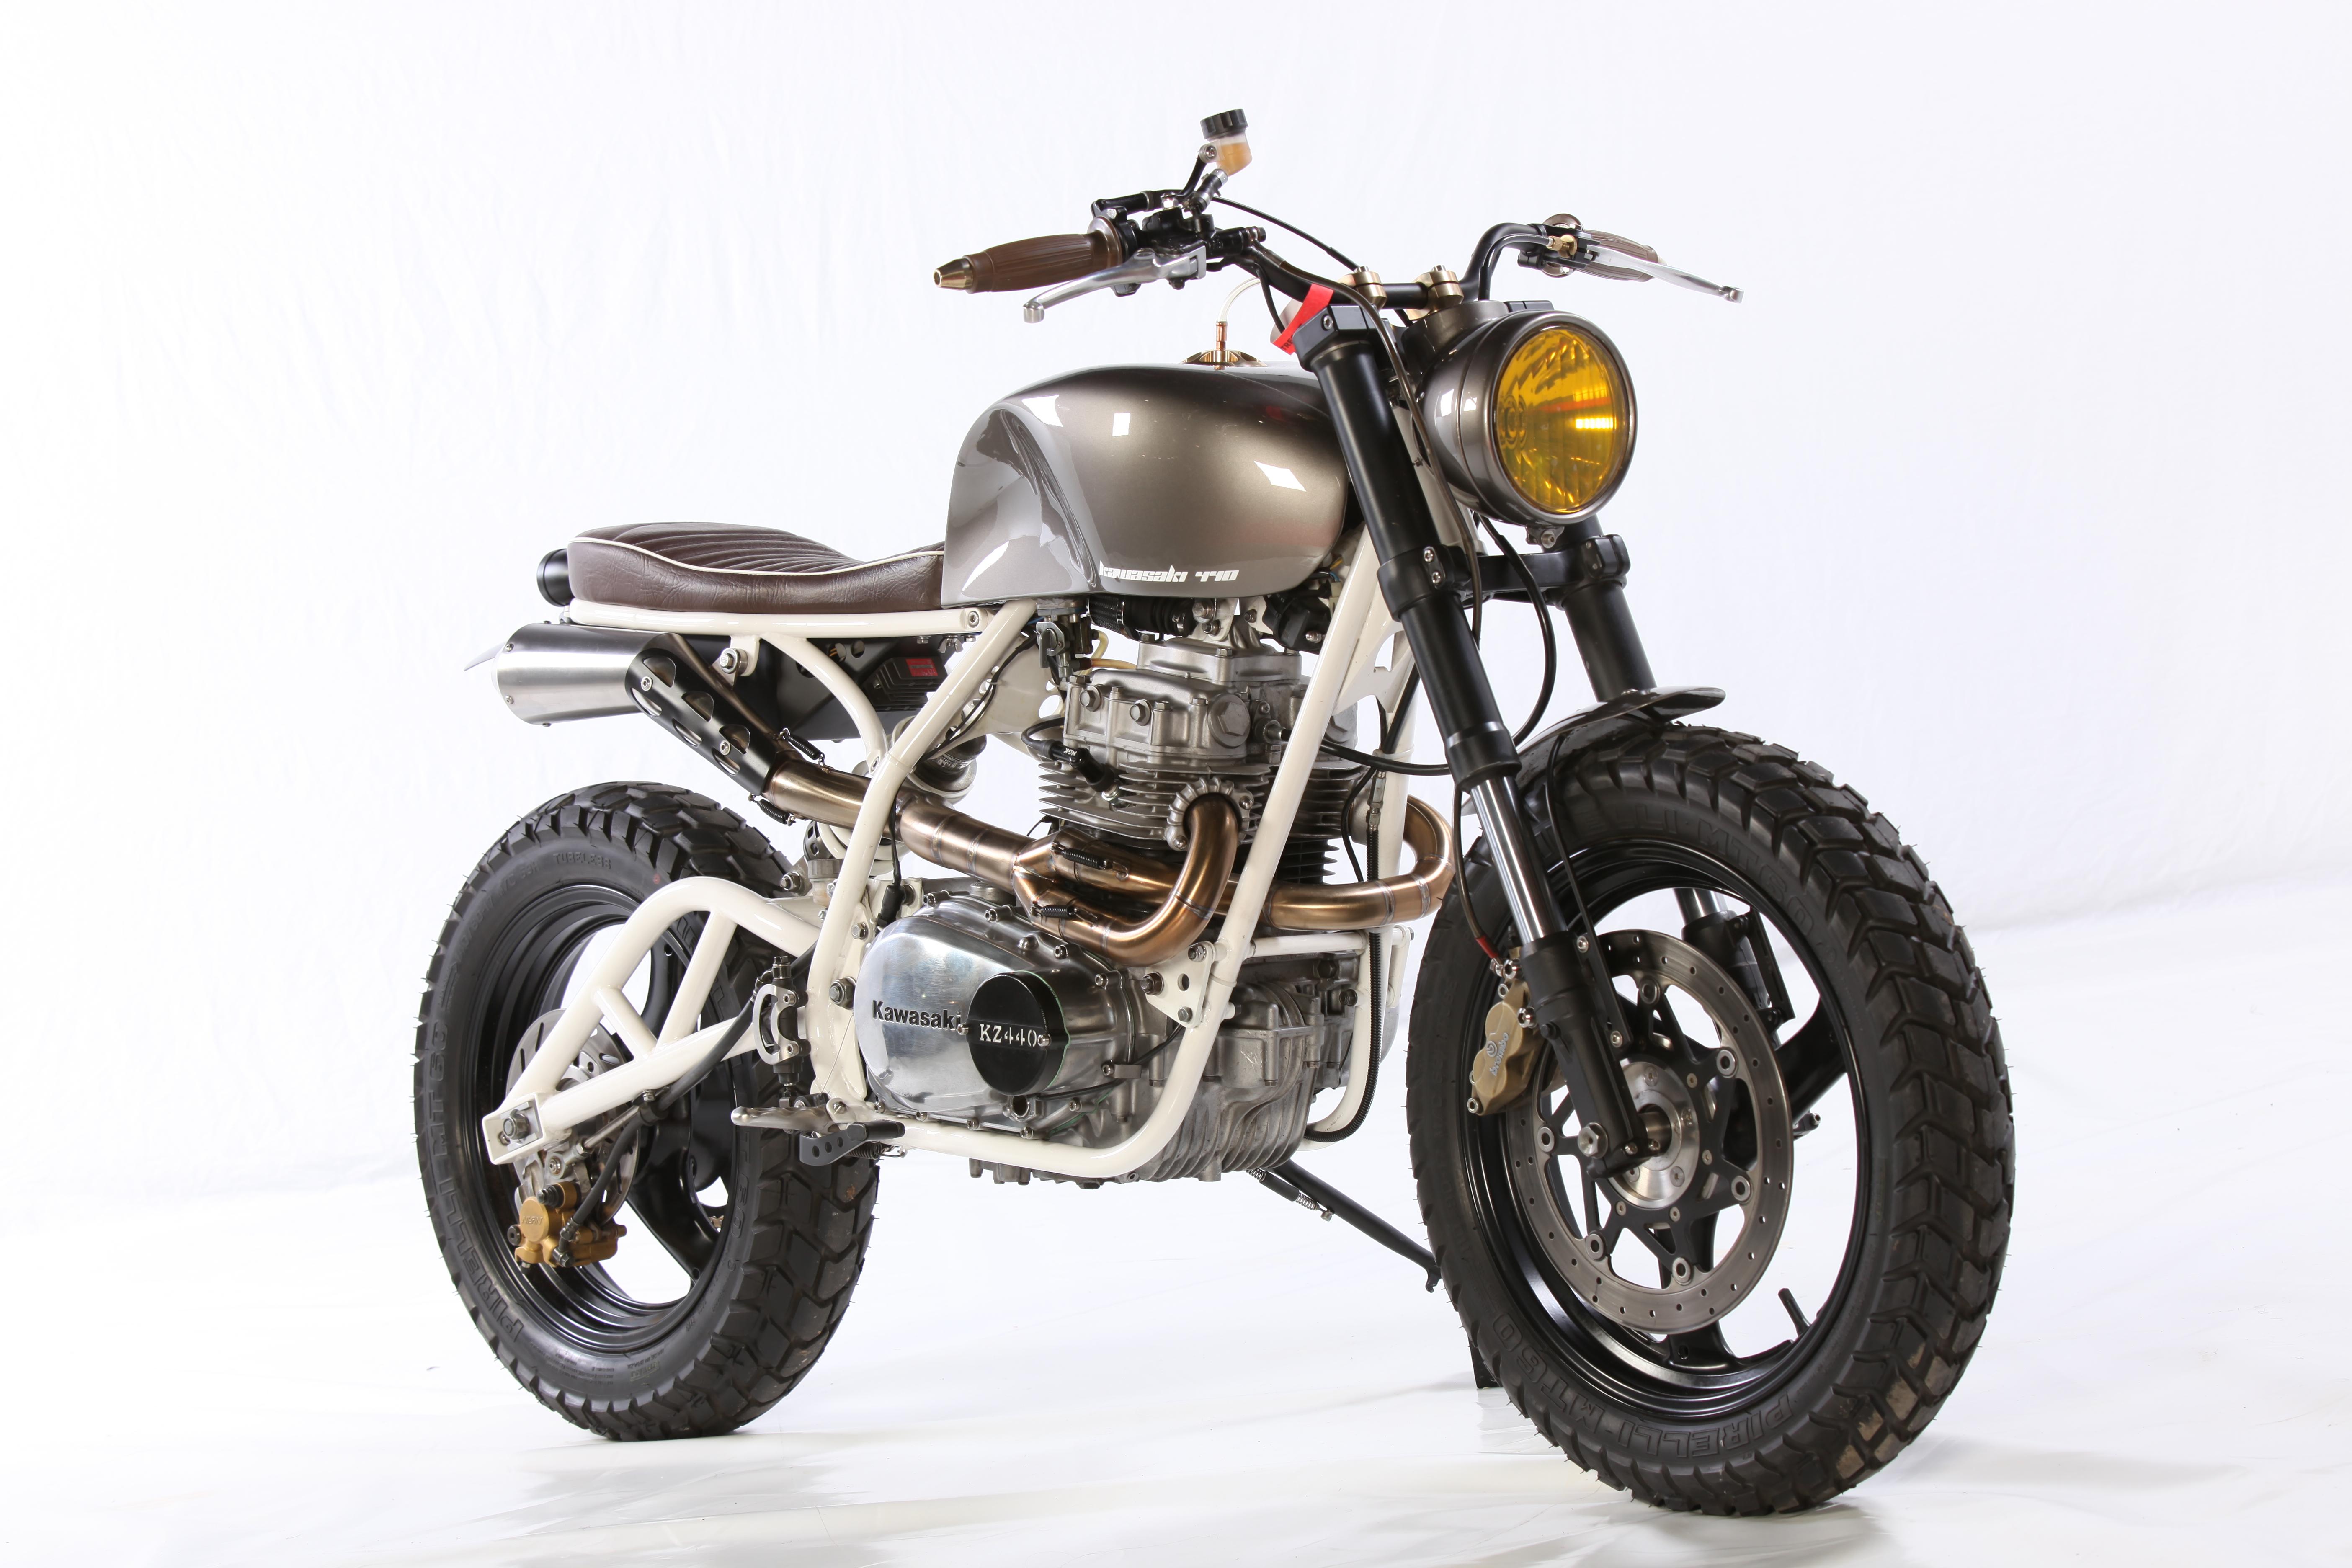 KZ400 Scrambler